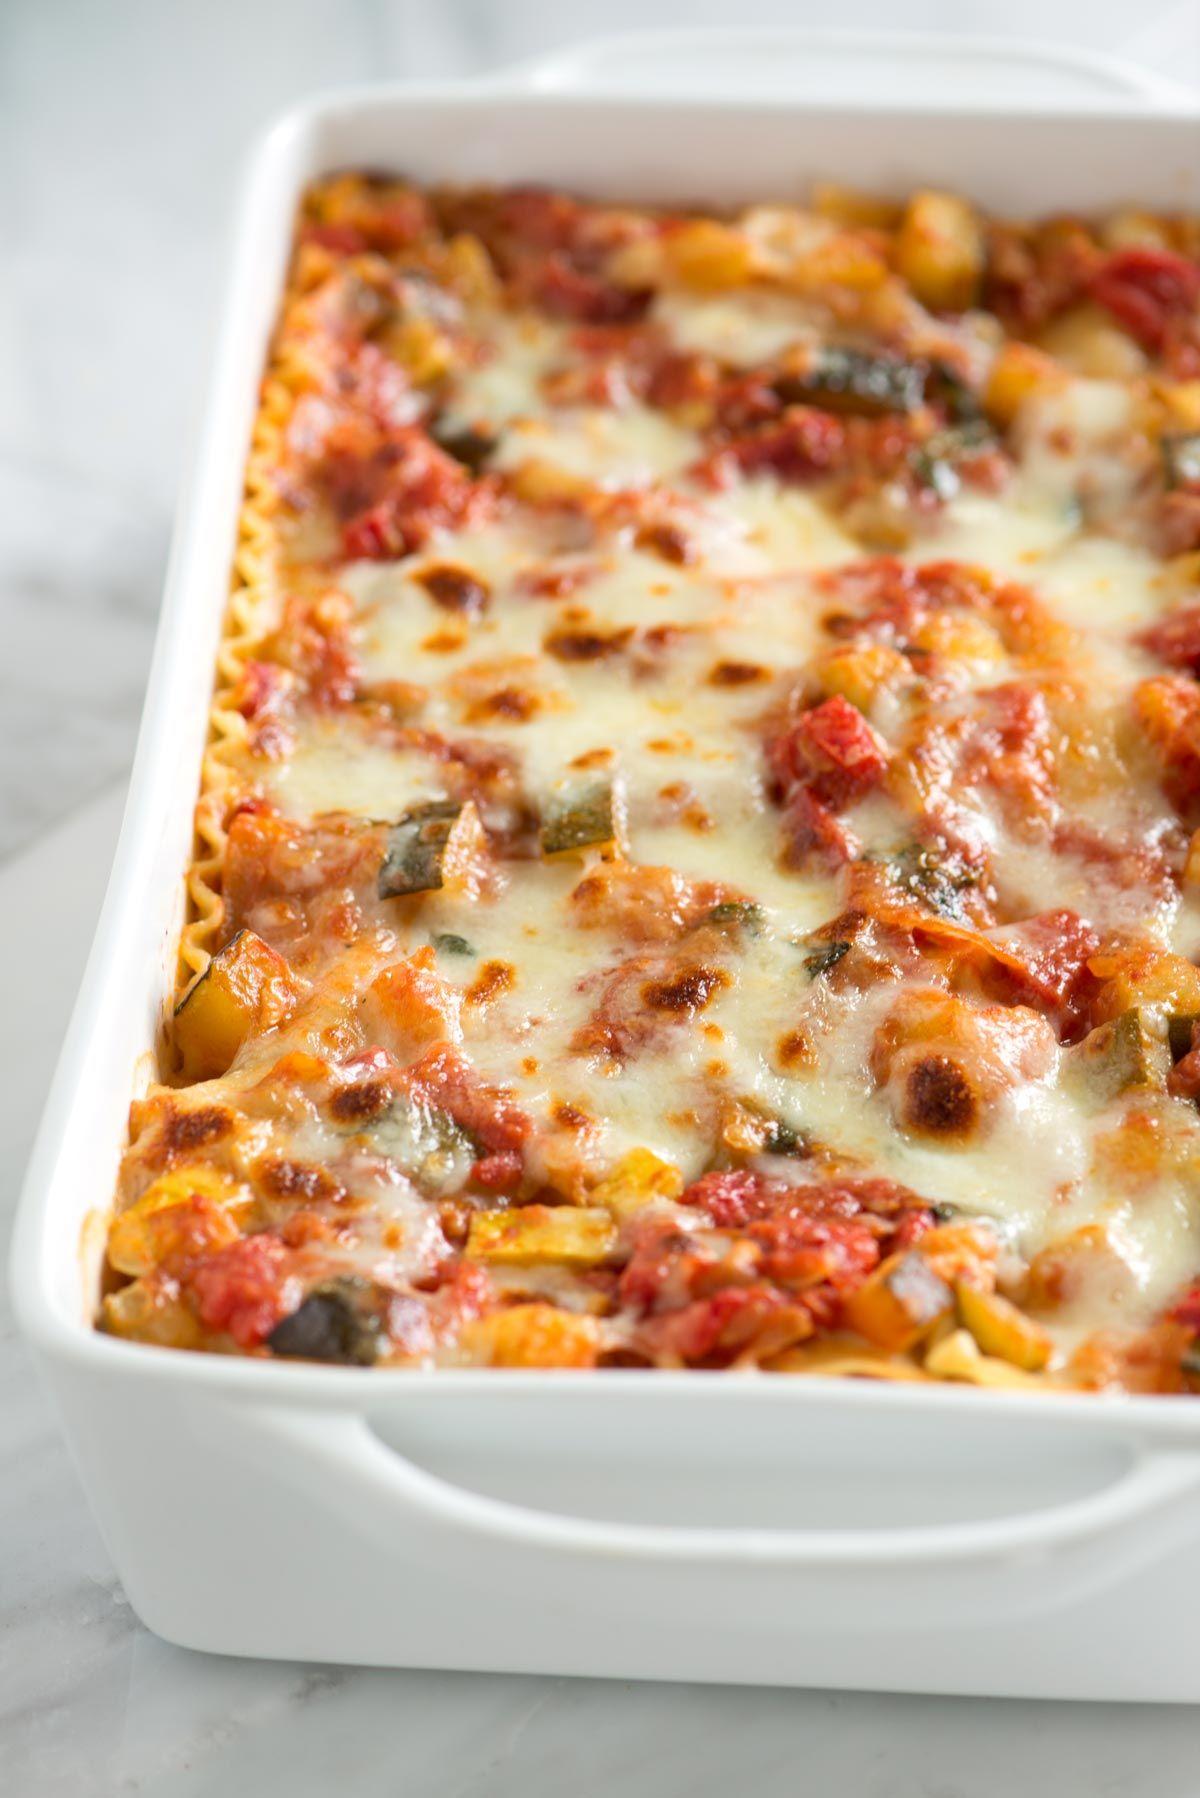 Easy Vegetable Lasagna Recipe Vegetable Lasagna Recipes Easy Vegetable Lasagna Recipes